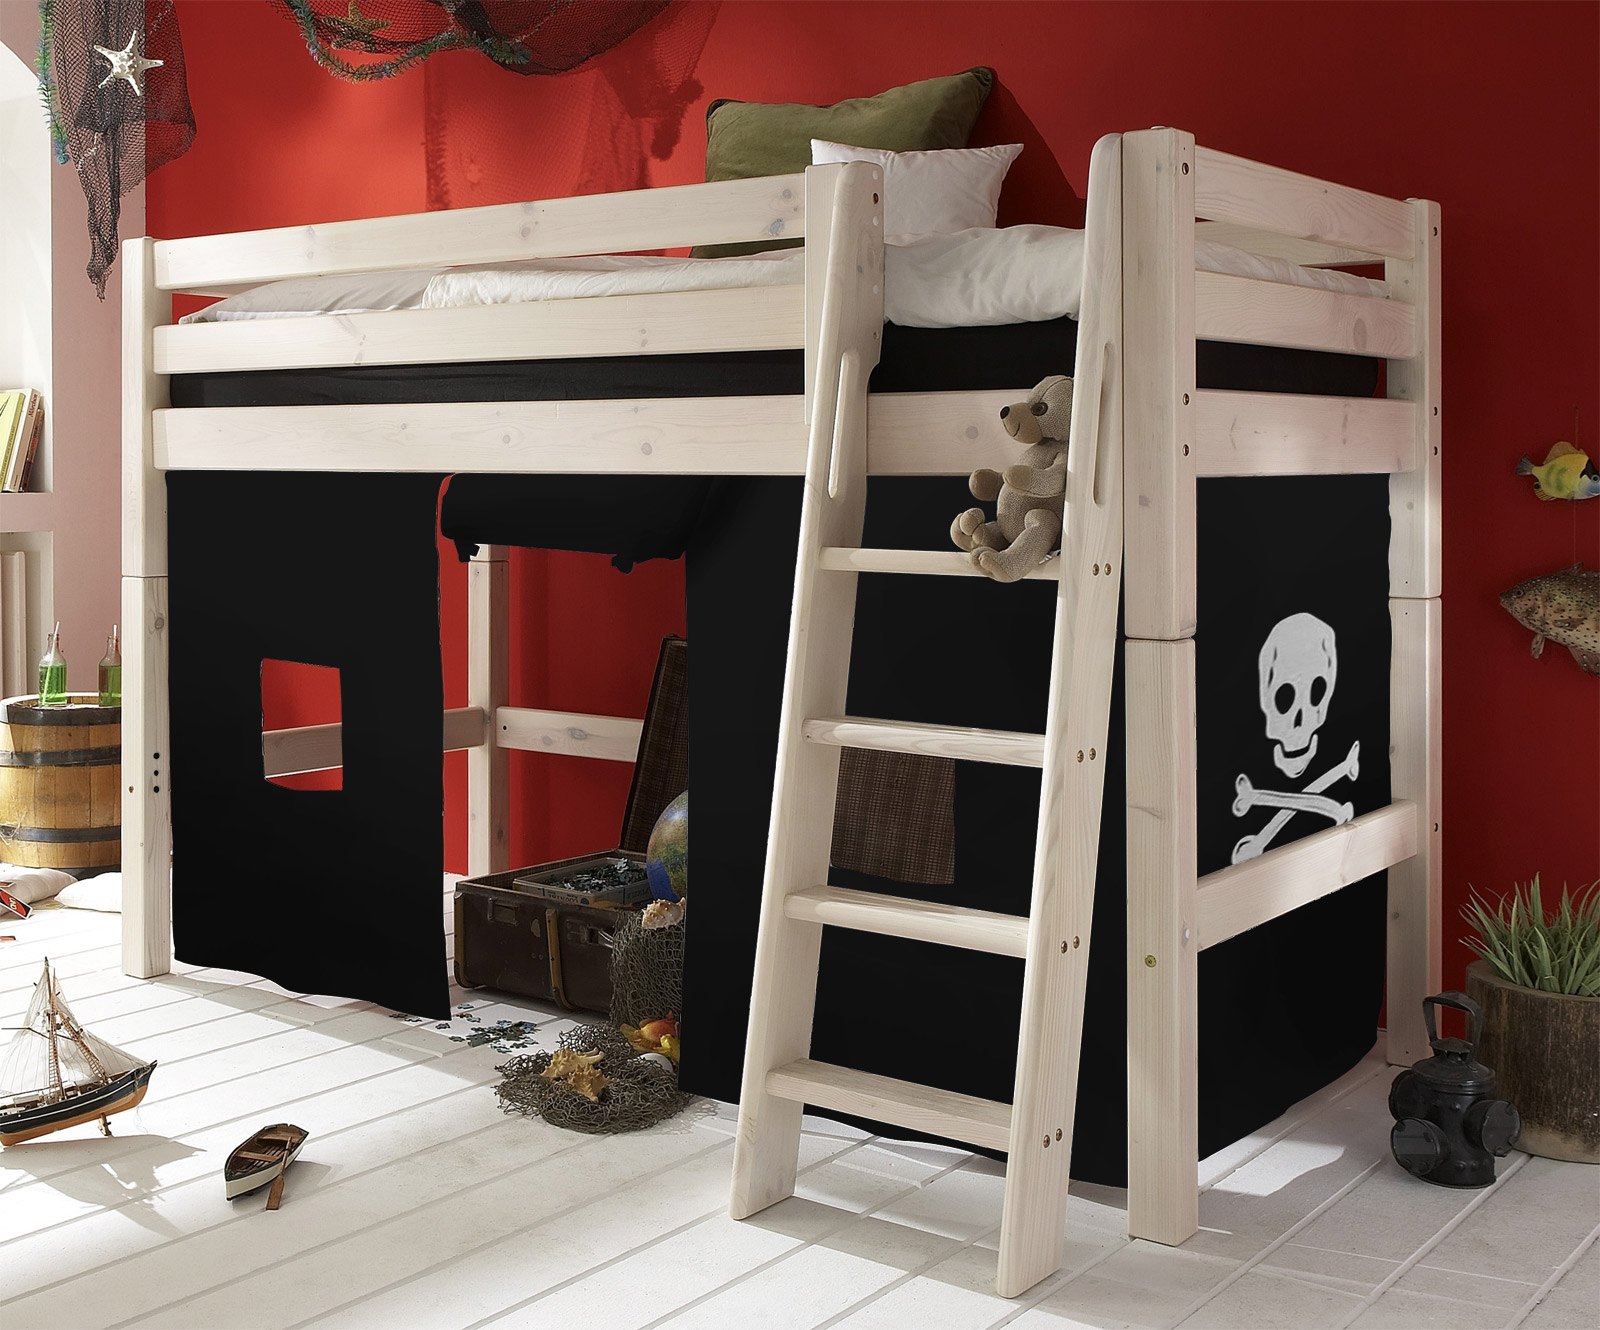 Etagenbett Umbaubar : Kinderbett weiß umbaubar u schöne hochbett